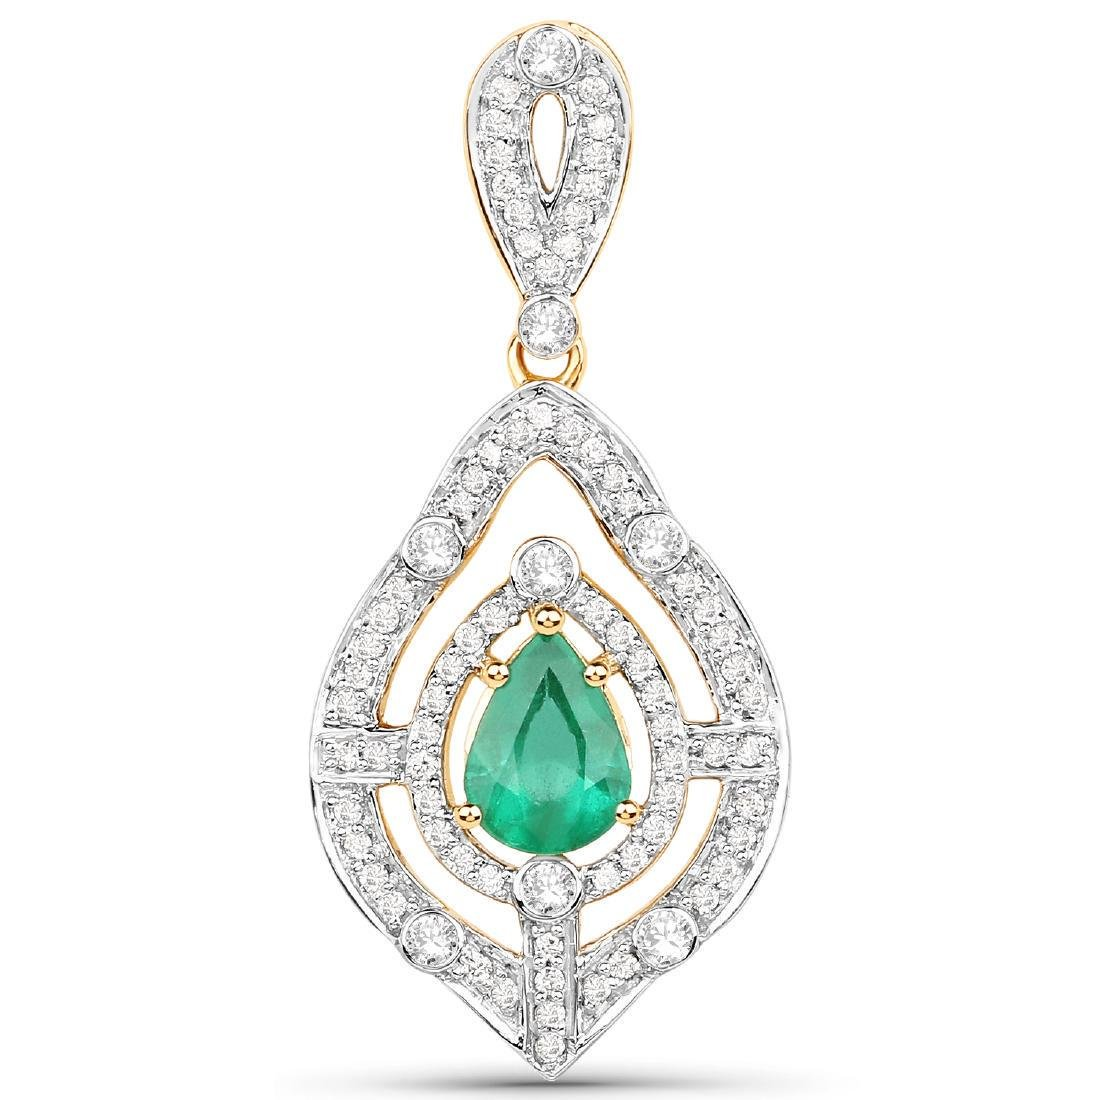 1.17 Carat Genuine Zambian Emerald and White Diamond